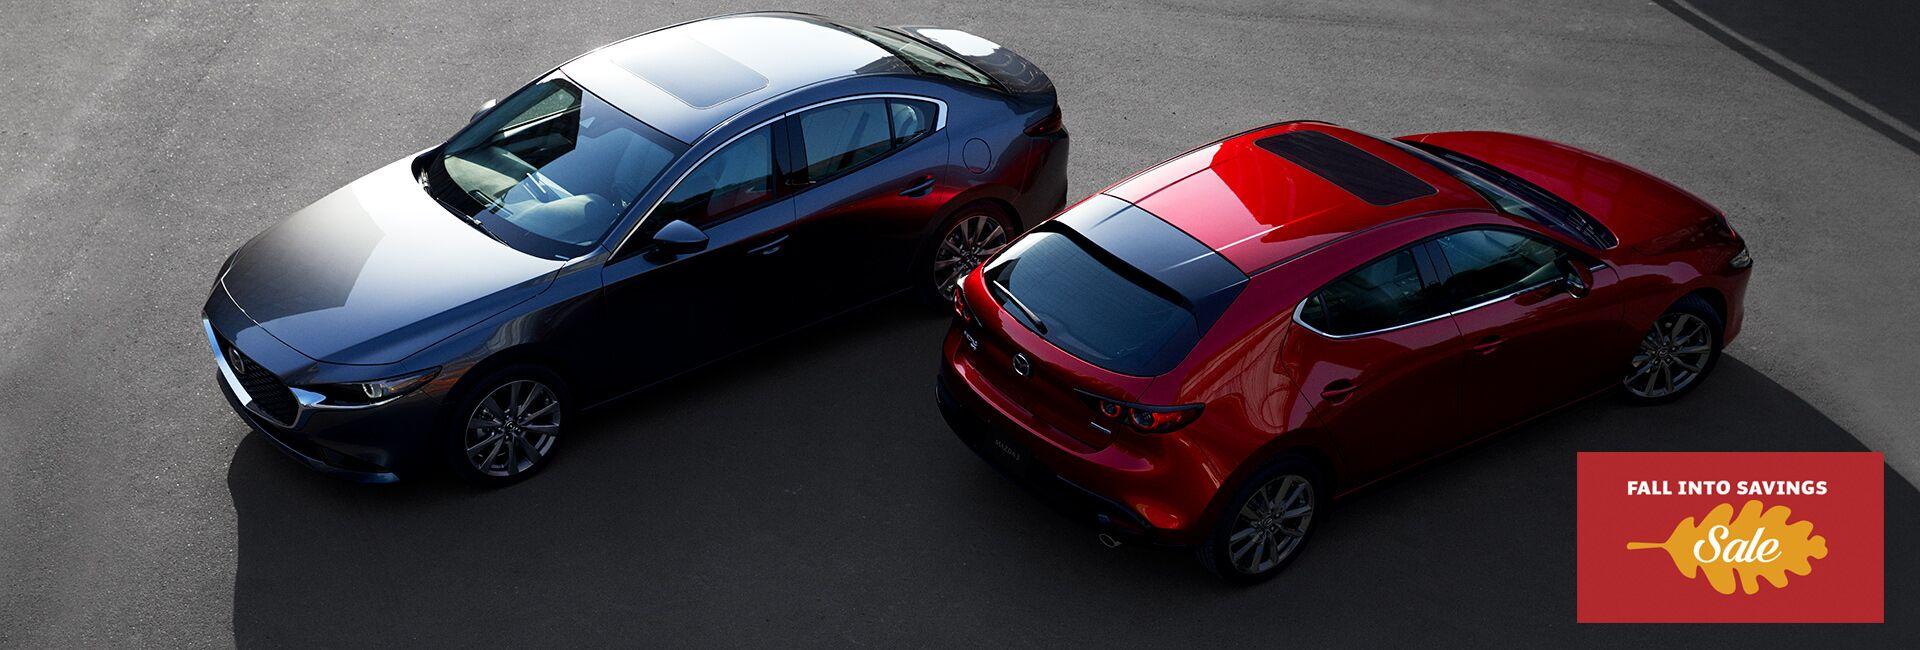 Used Car Dealerships Rochester Ny >> Mazda Dealership Rochester Ny Used Cars Marketplace Mazda